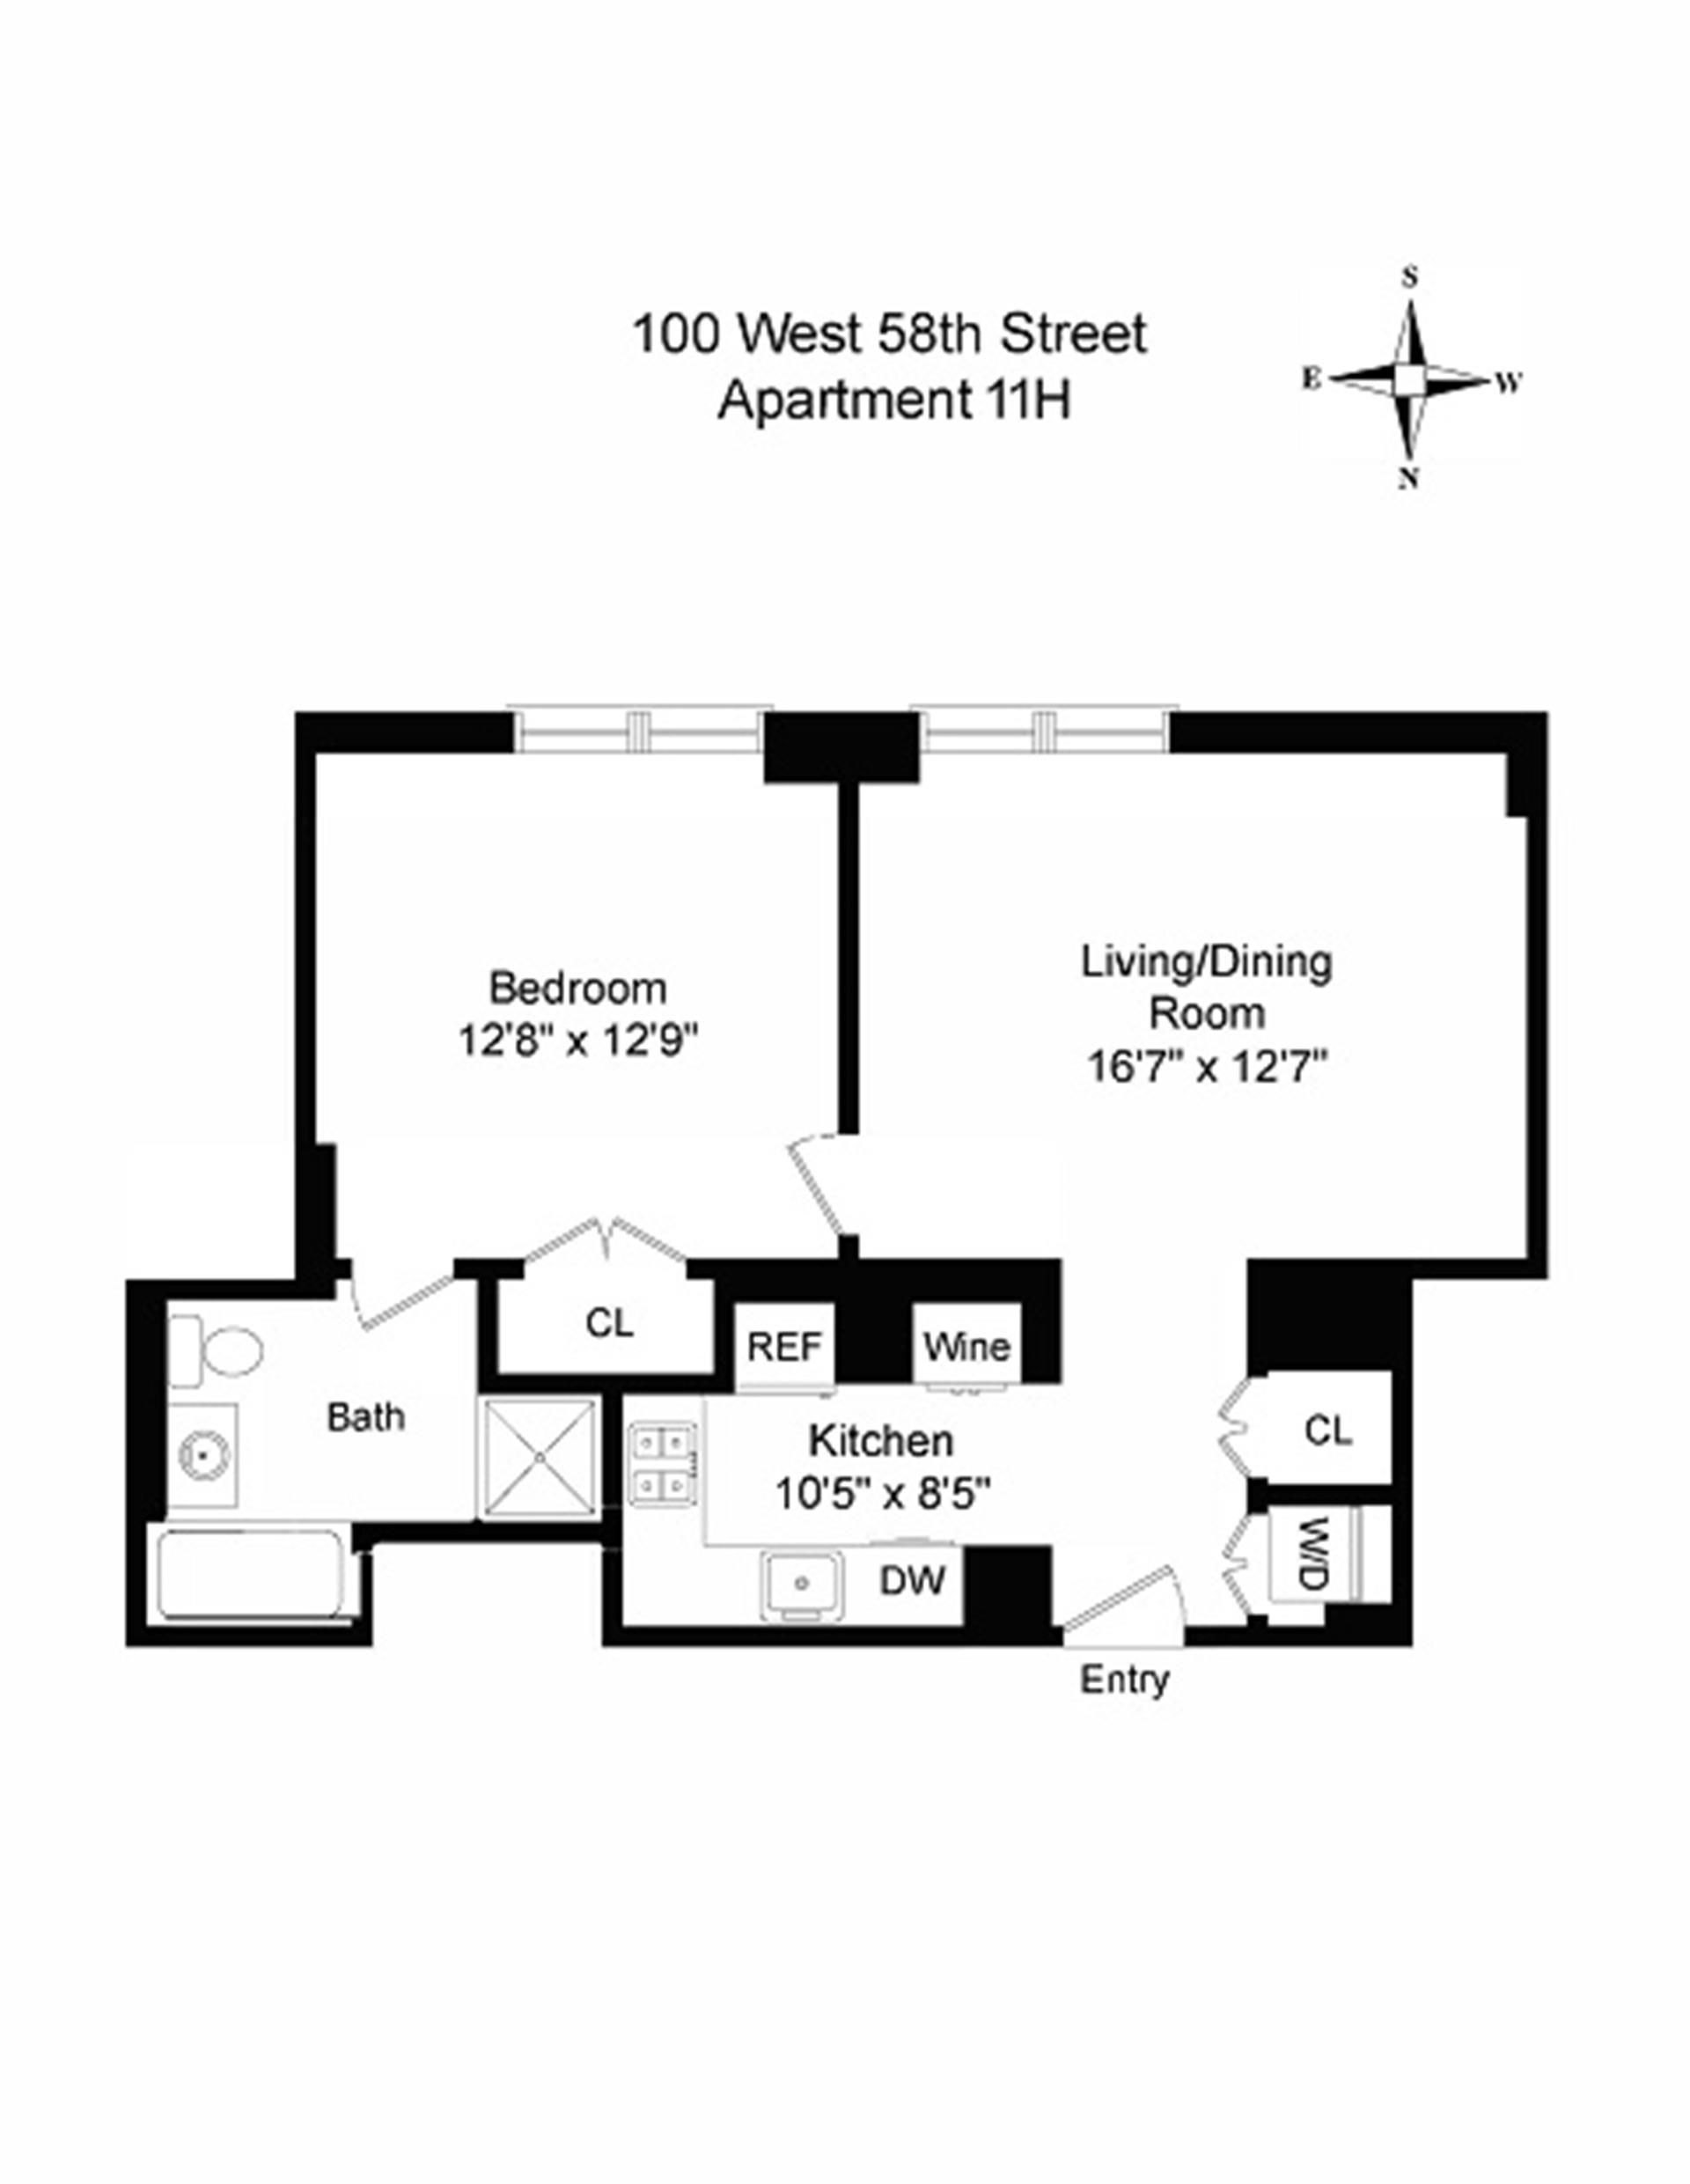 Floor plan of 100 West 58th St, 11H - Midtown, New York